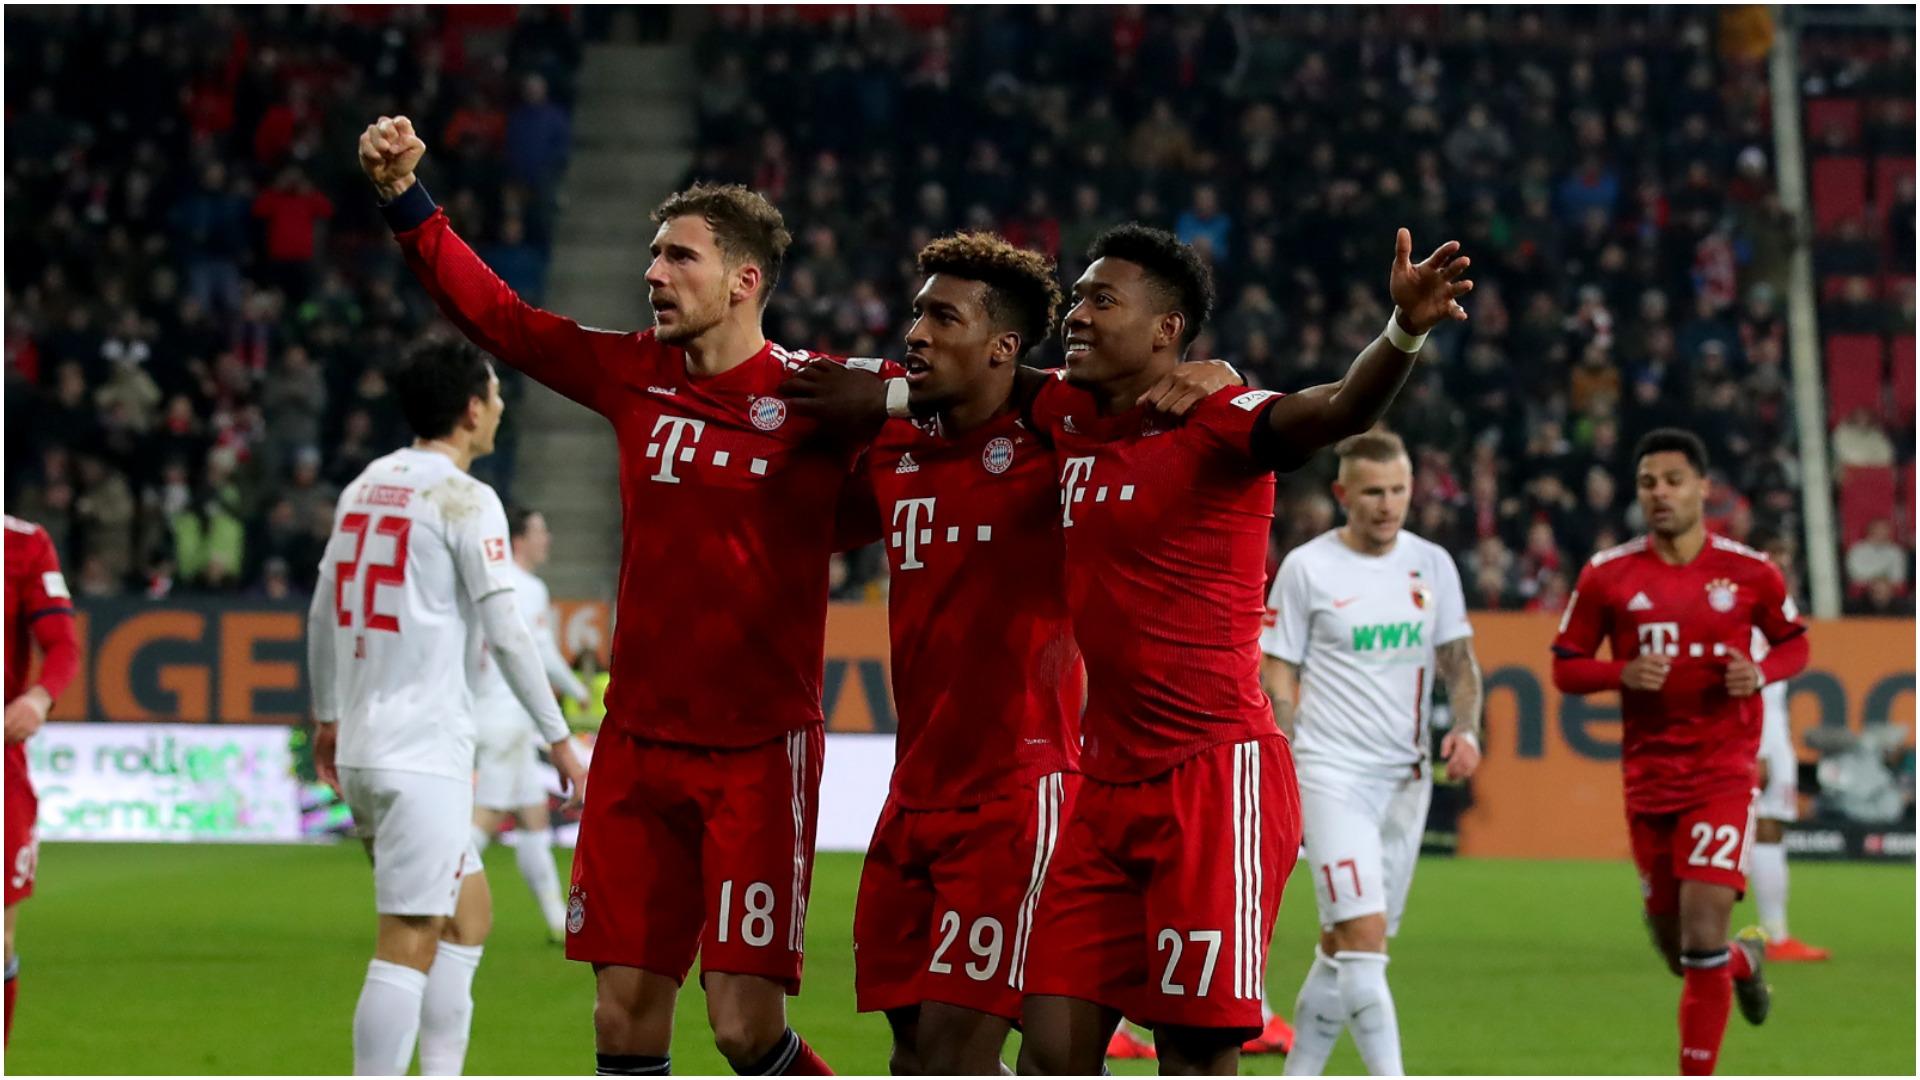 Kovac: Bayern had Liverpool on mind